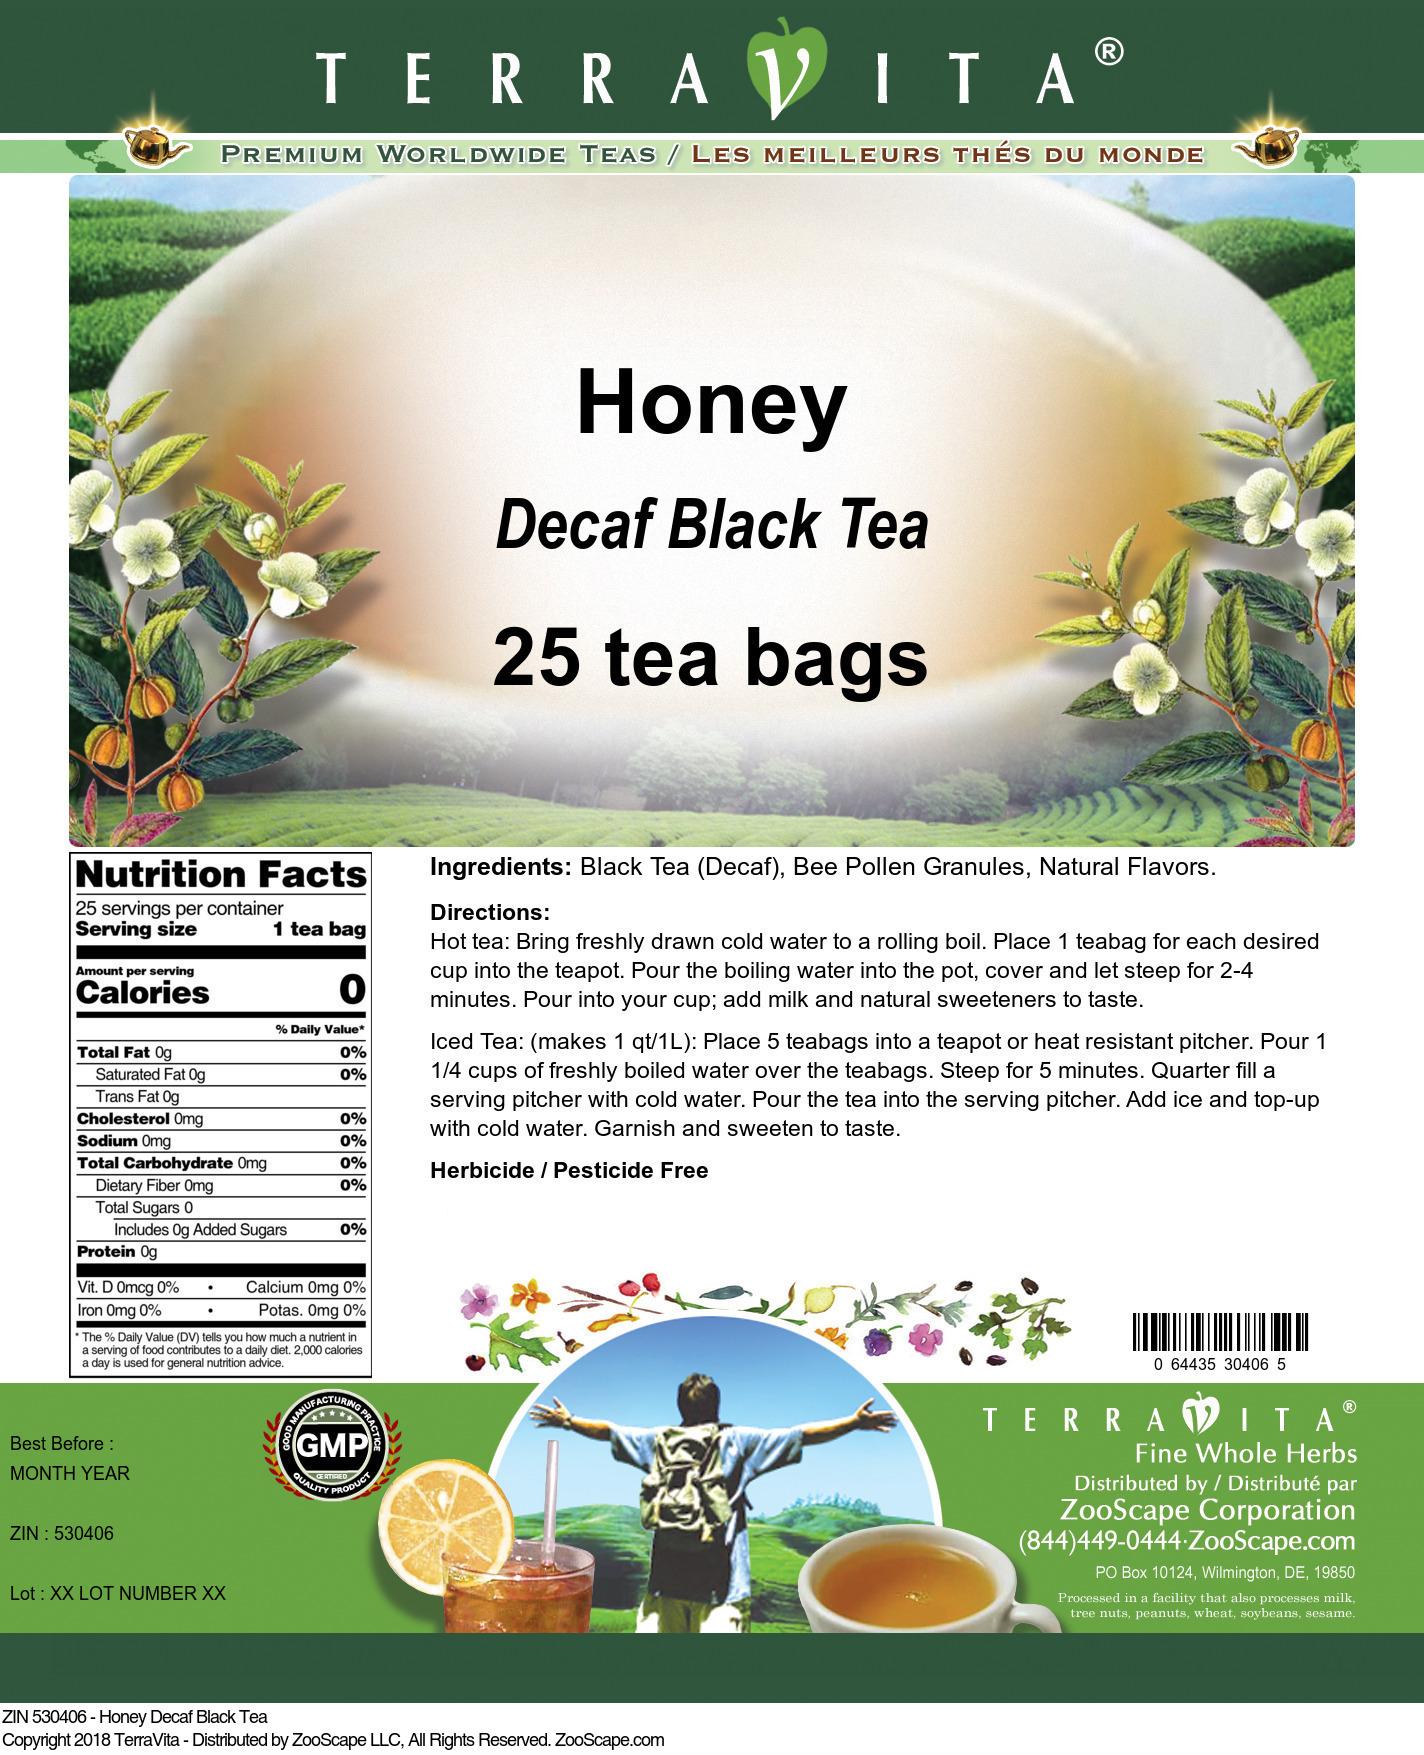 Honey Decaf Black Tea